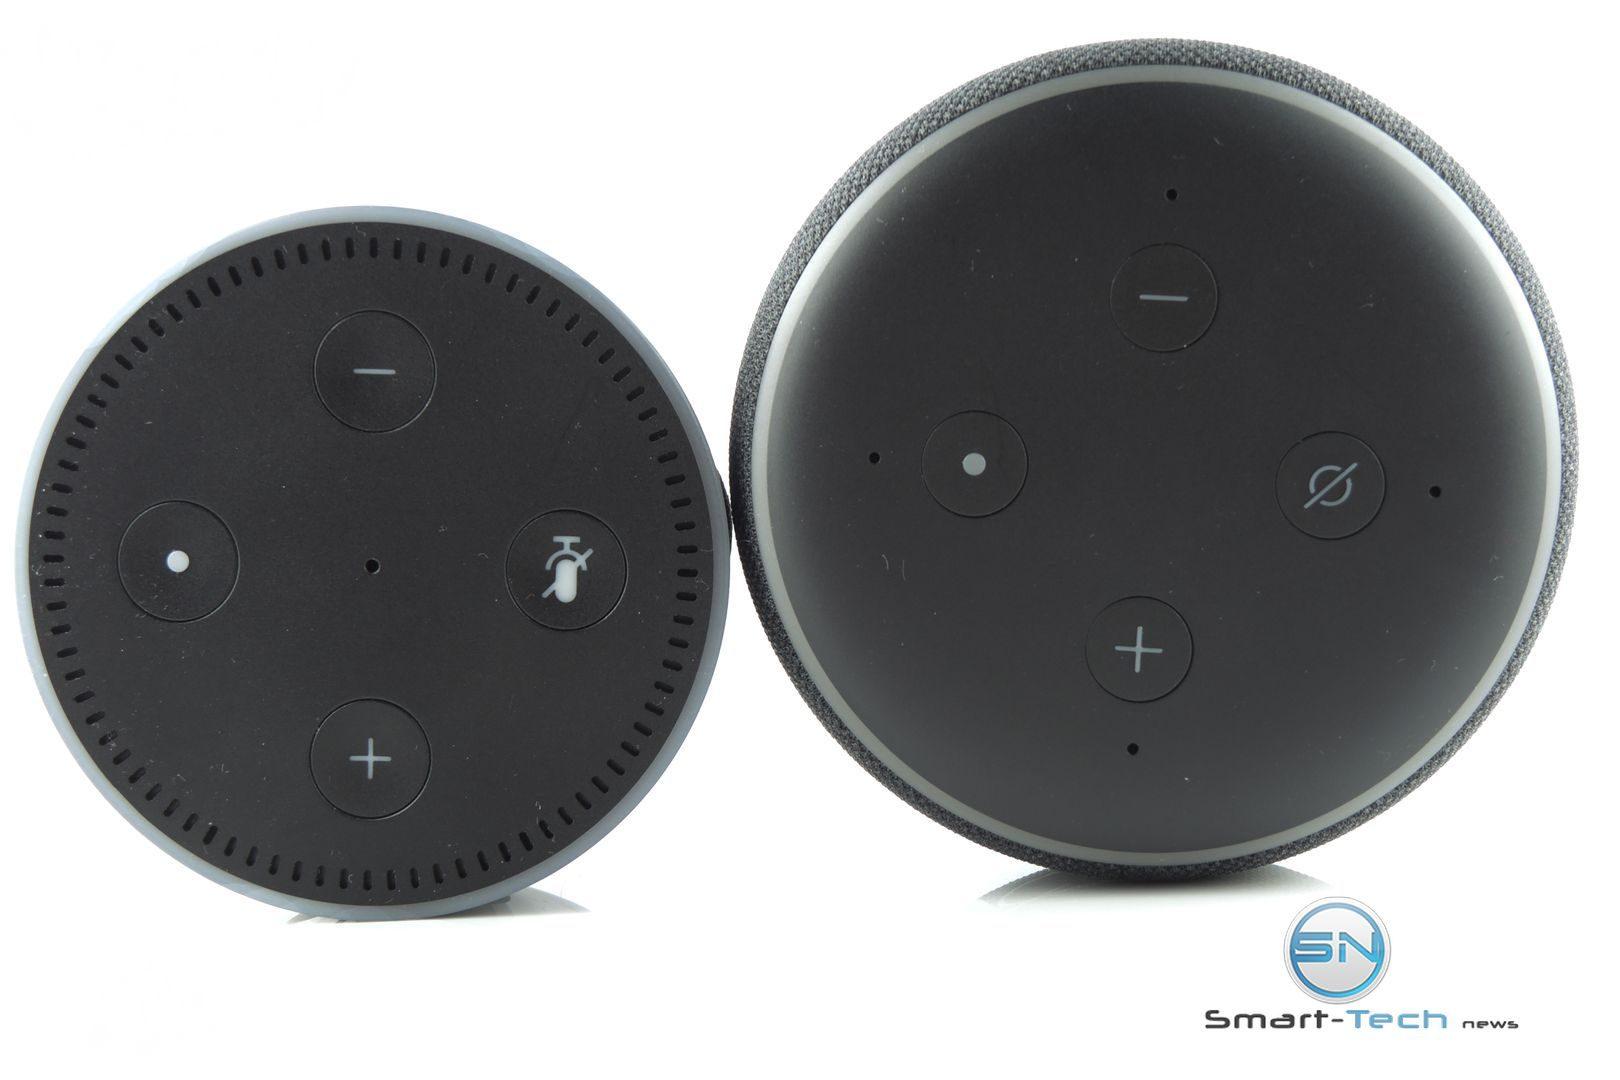 Ansicht oben - Amazon Echo Dot 3 vs Dot 2 - SmartTechNews